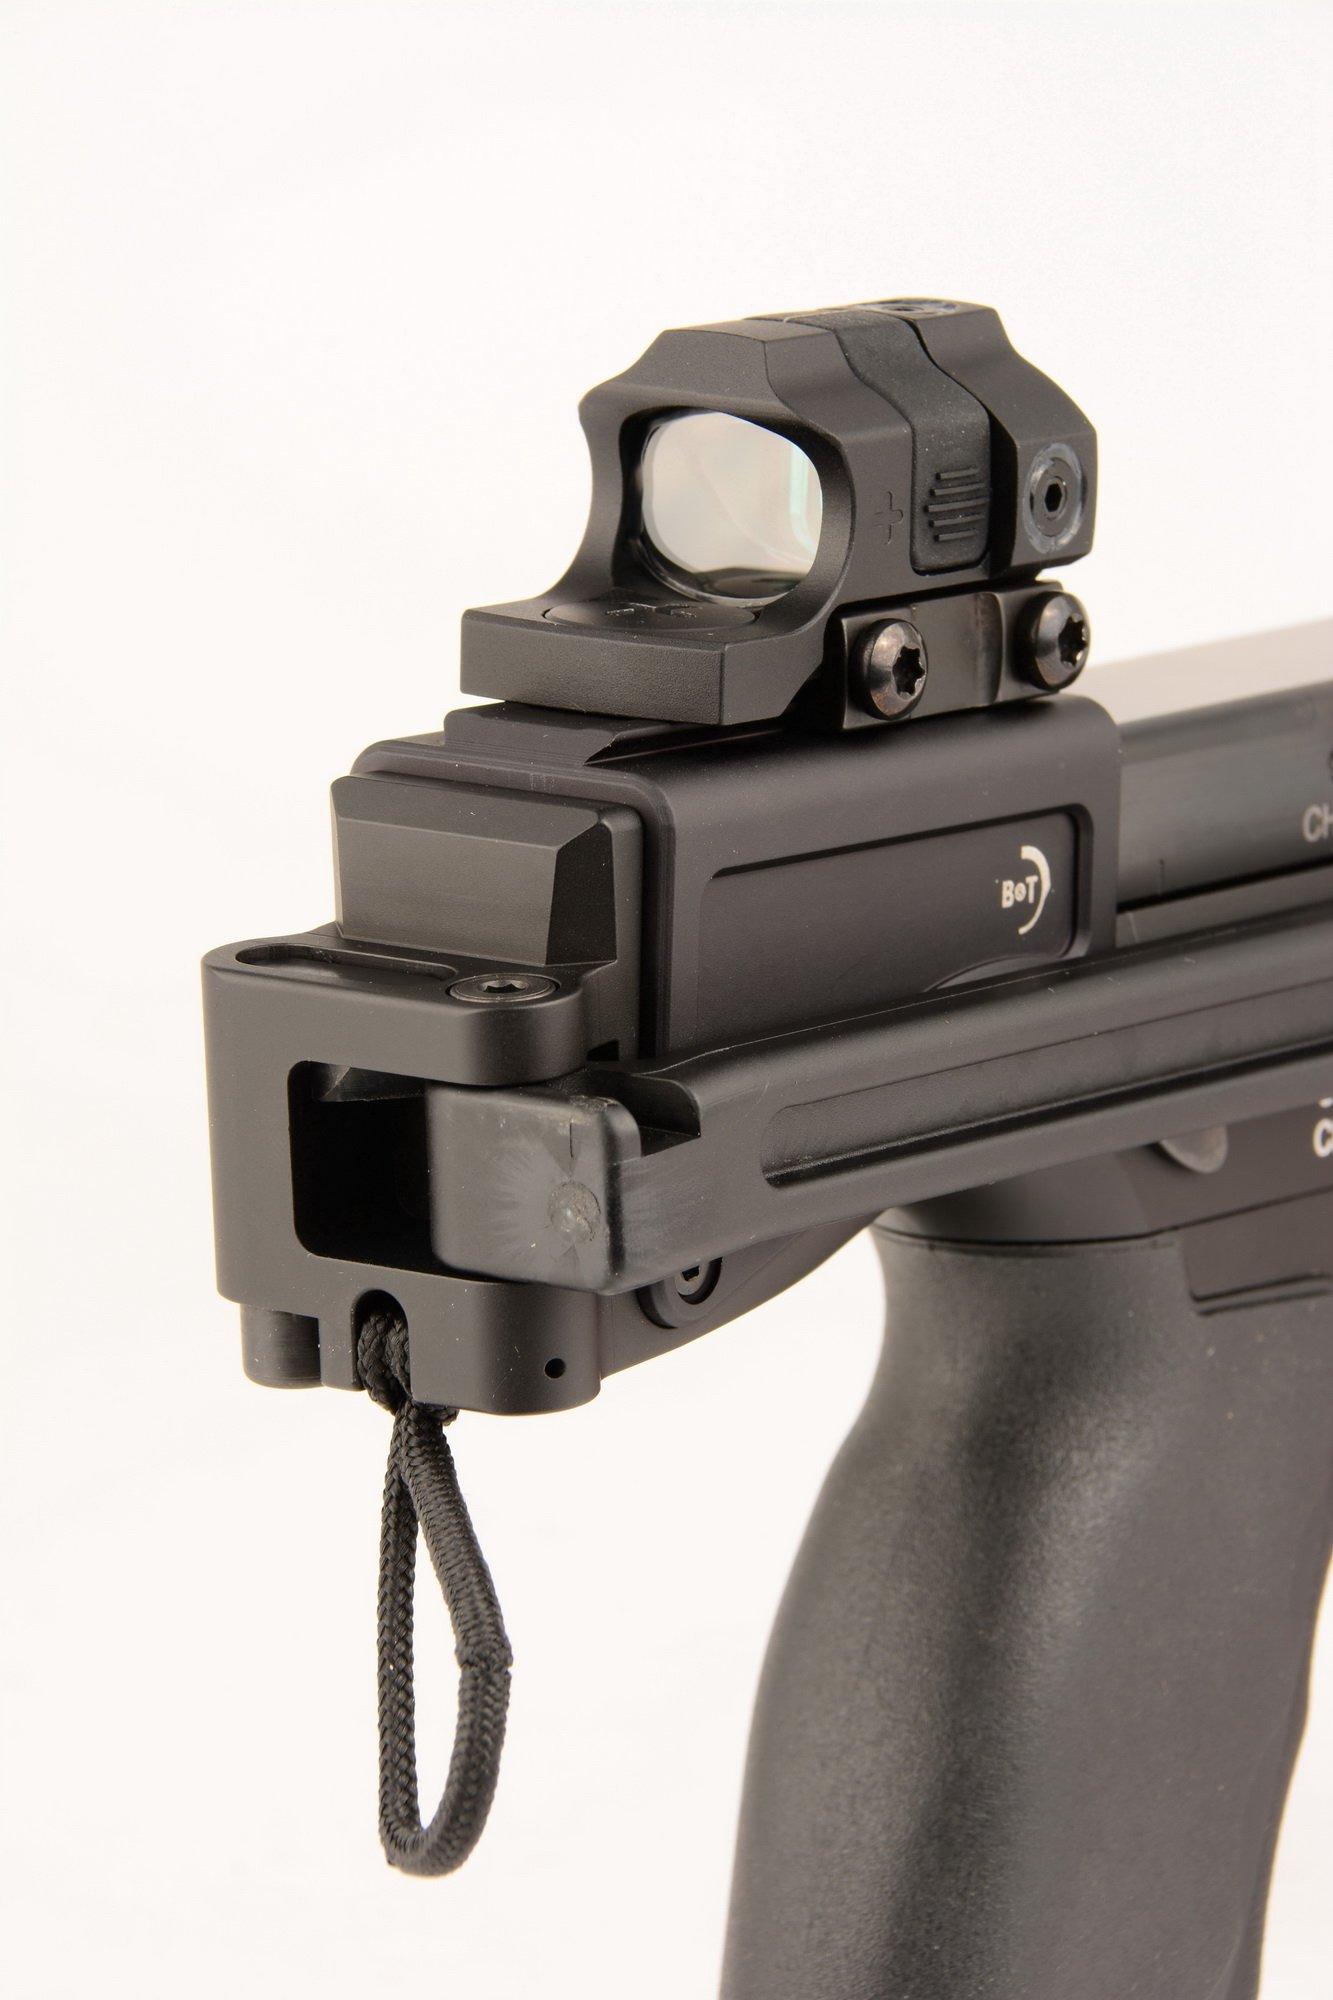 Pistola de rango extendido USW de B&T